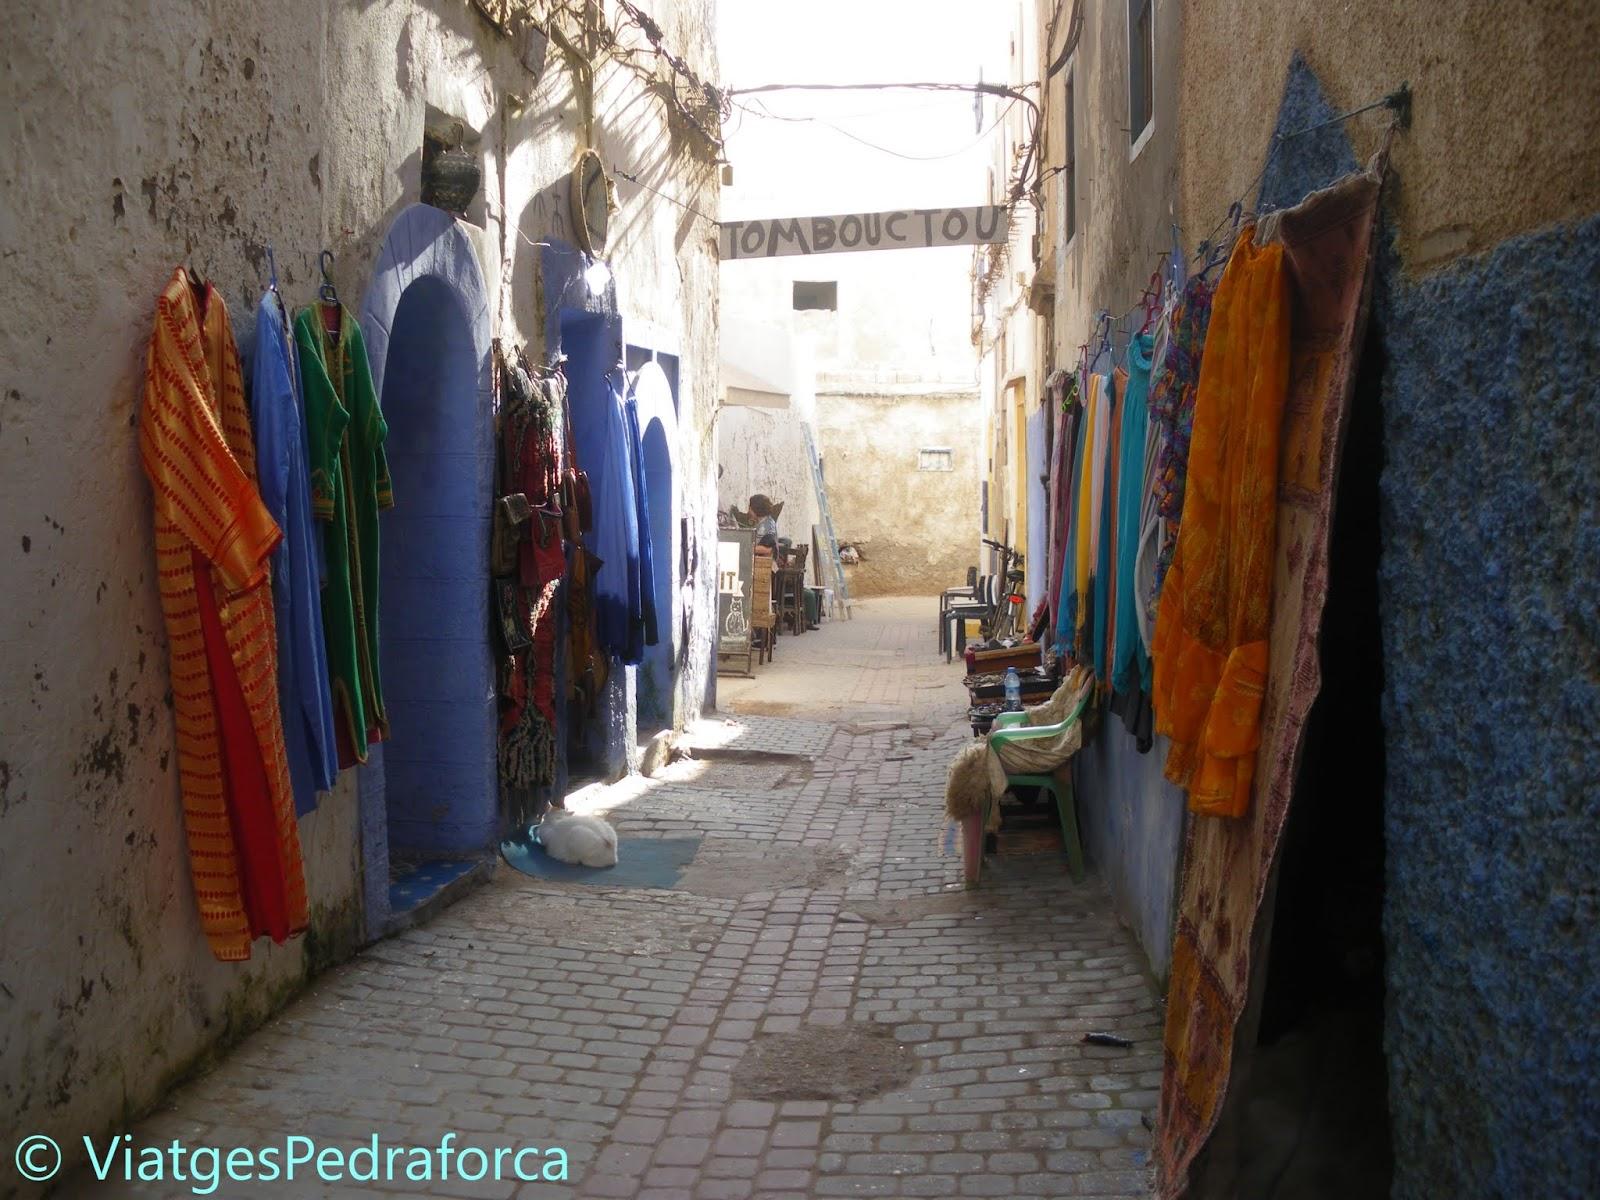 Marroc, Patrimoni de la Humanitat, Unesco Heritage